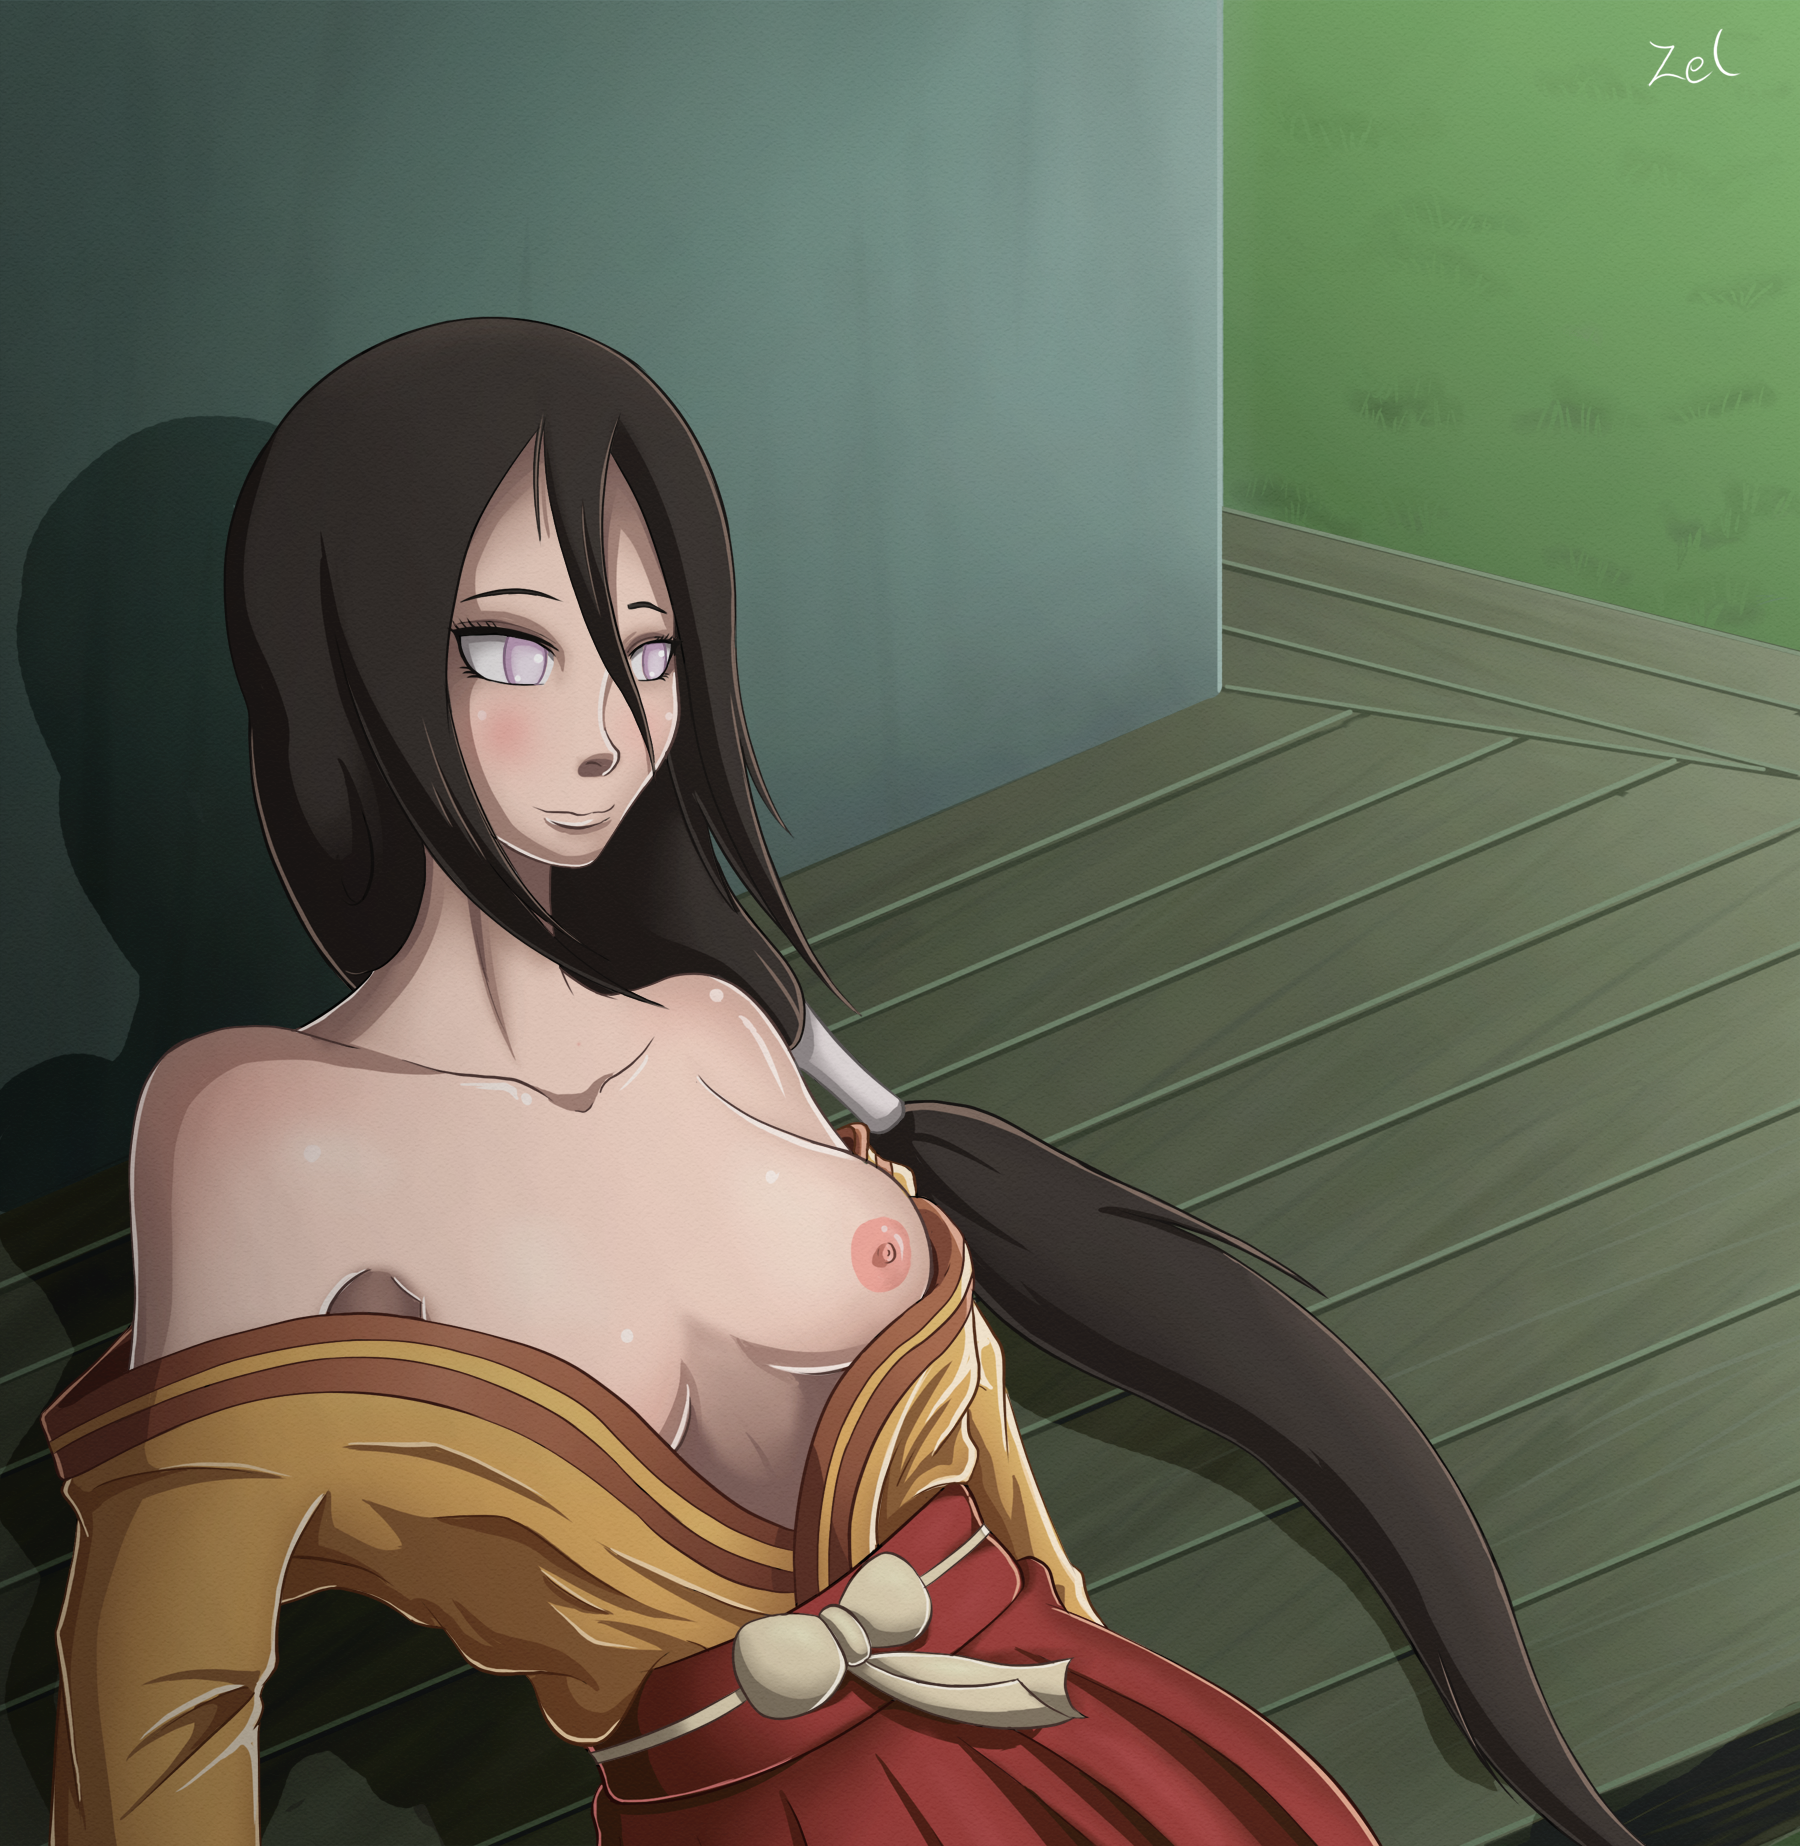 Hanabi Hyuuga relaxing